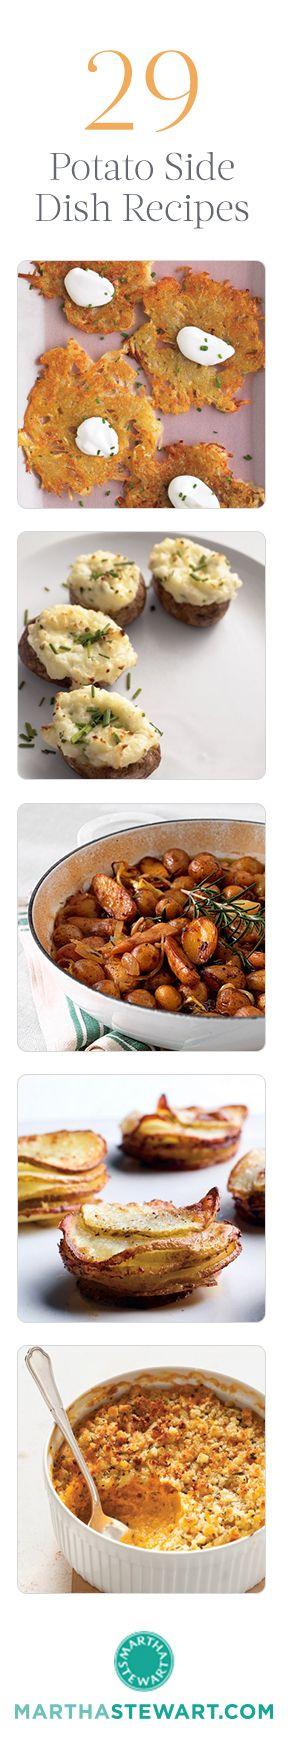 29 Potato Side Dish Recipes. Because I really need more ways to love potatoes. Bah!